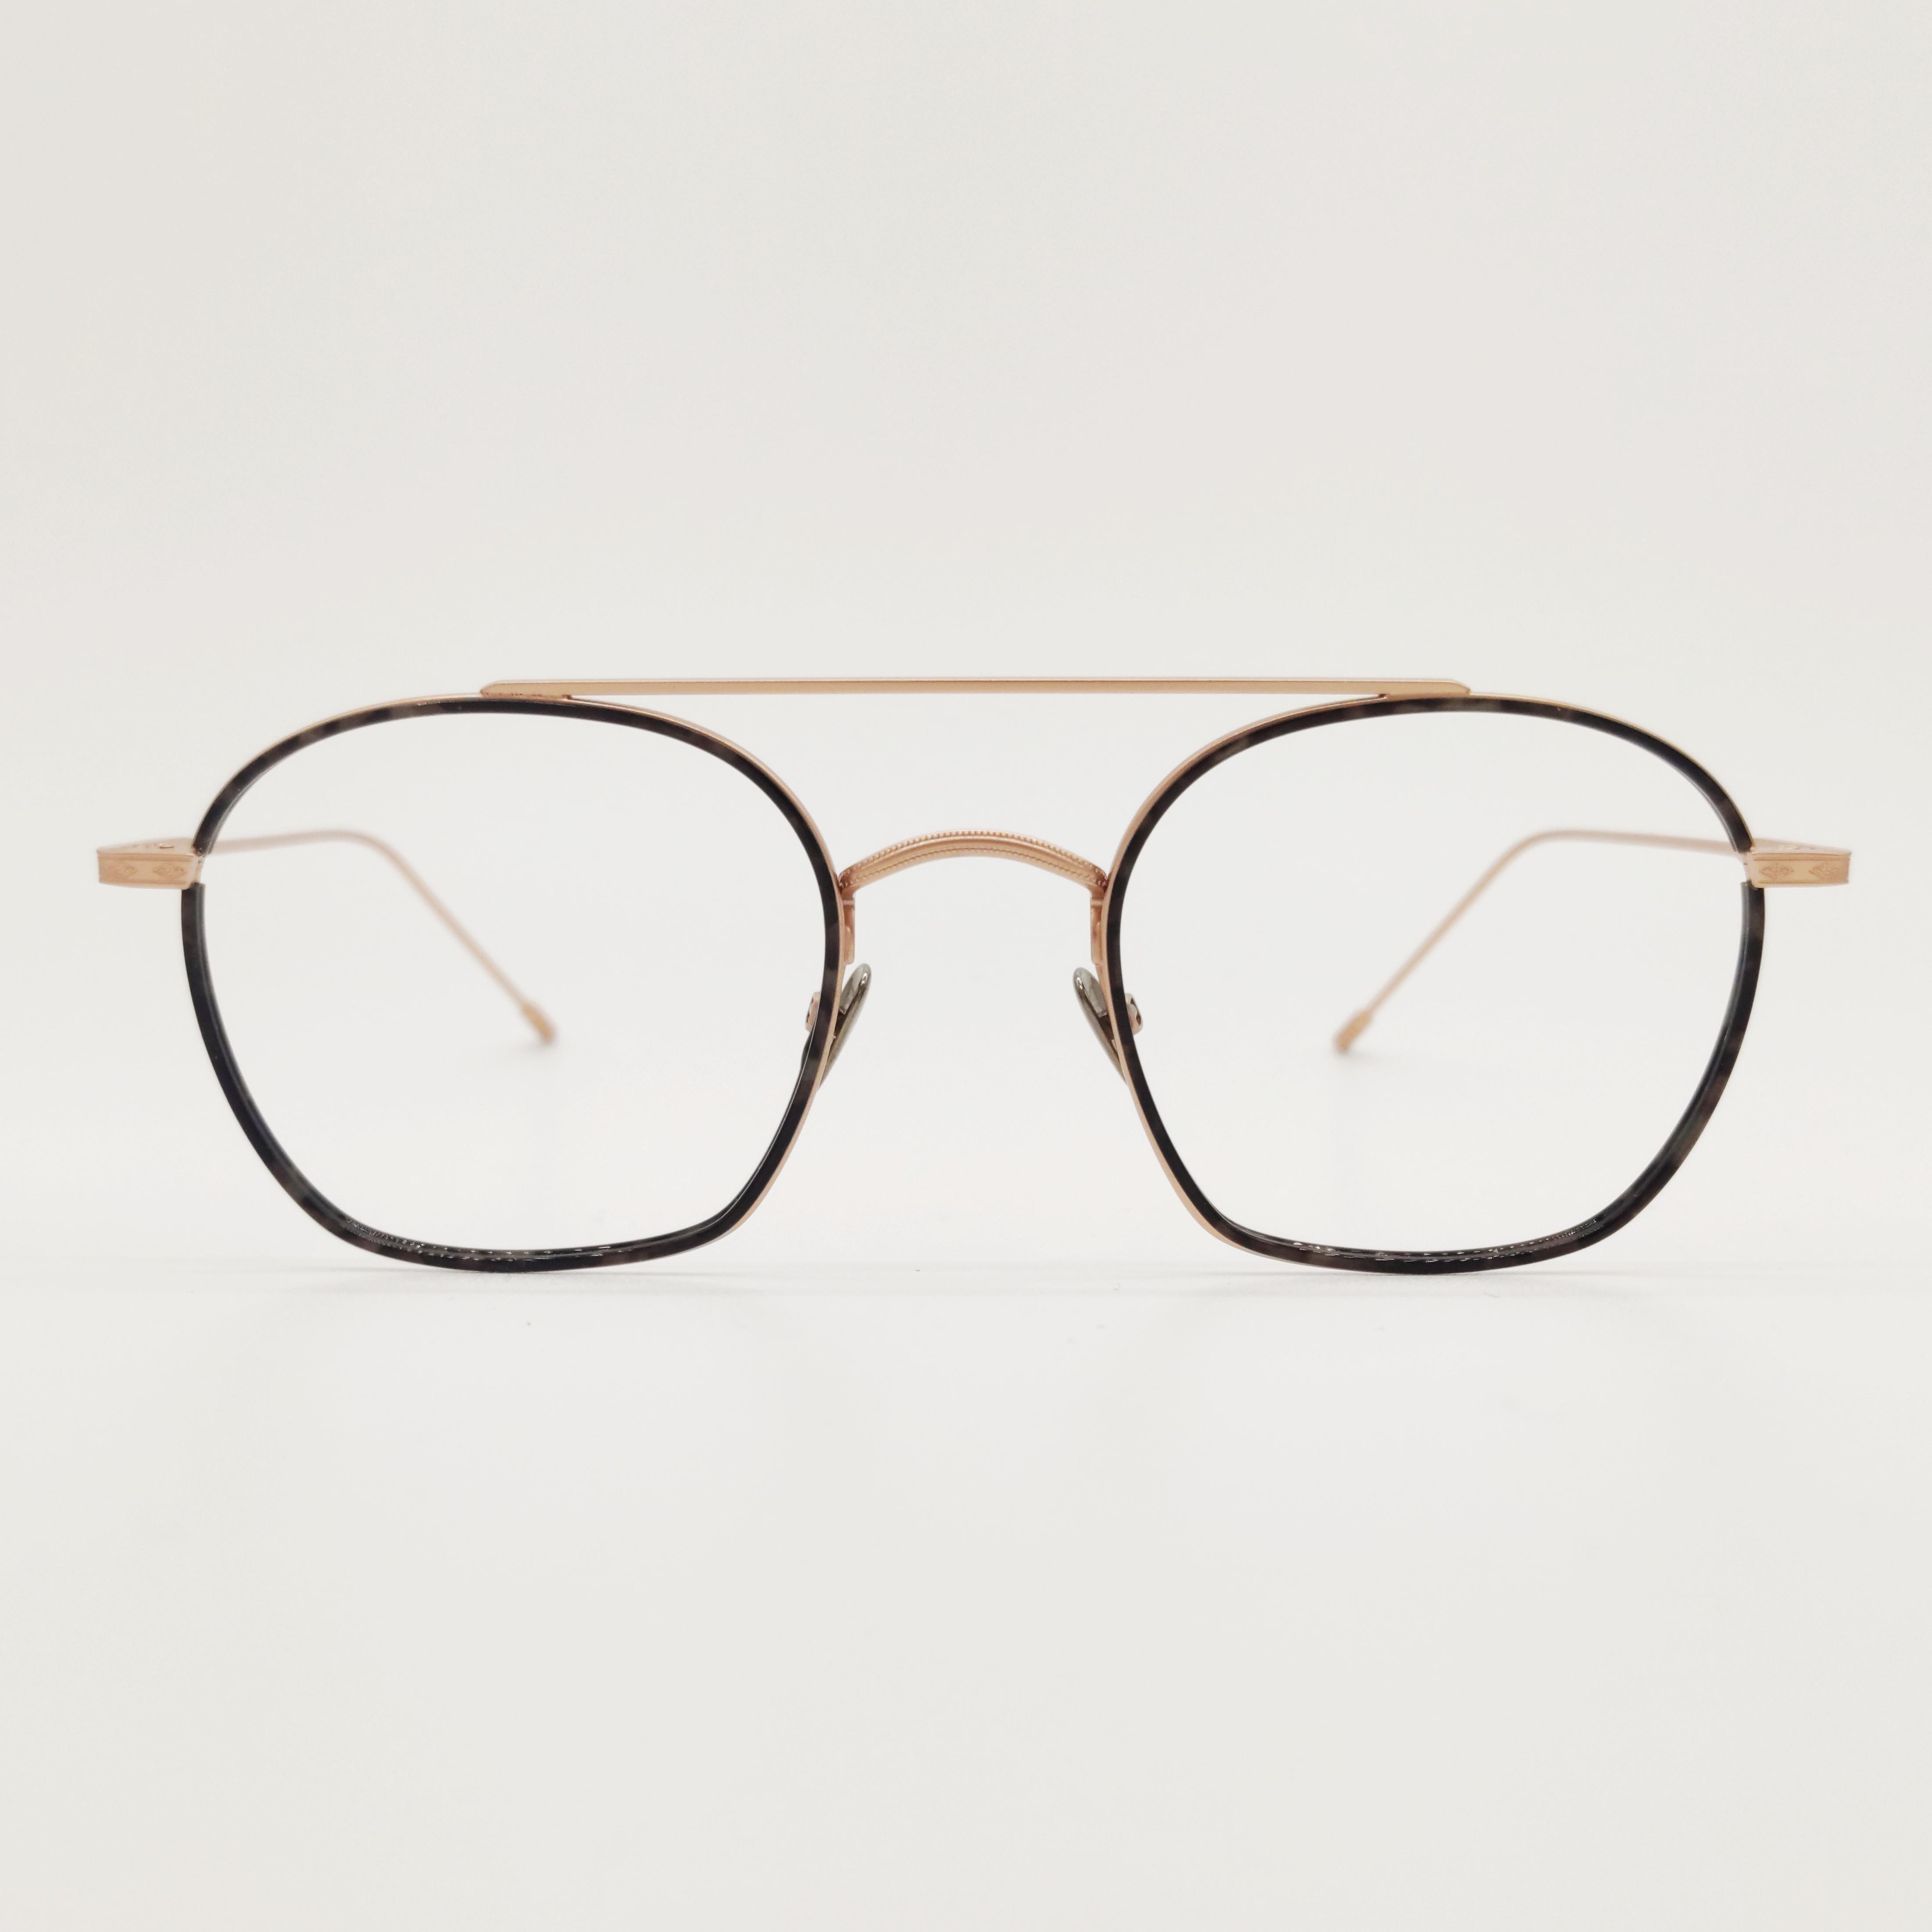 Modèle Howard Edwardson Eyewear La Lunetterie Clermontoise